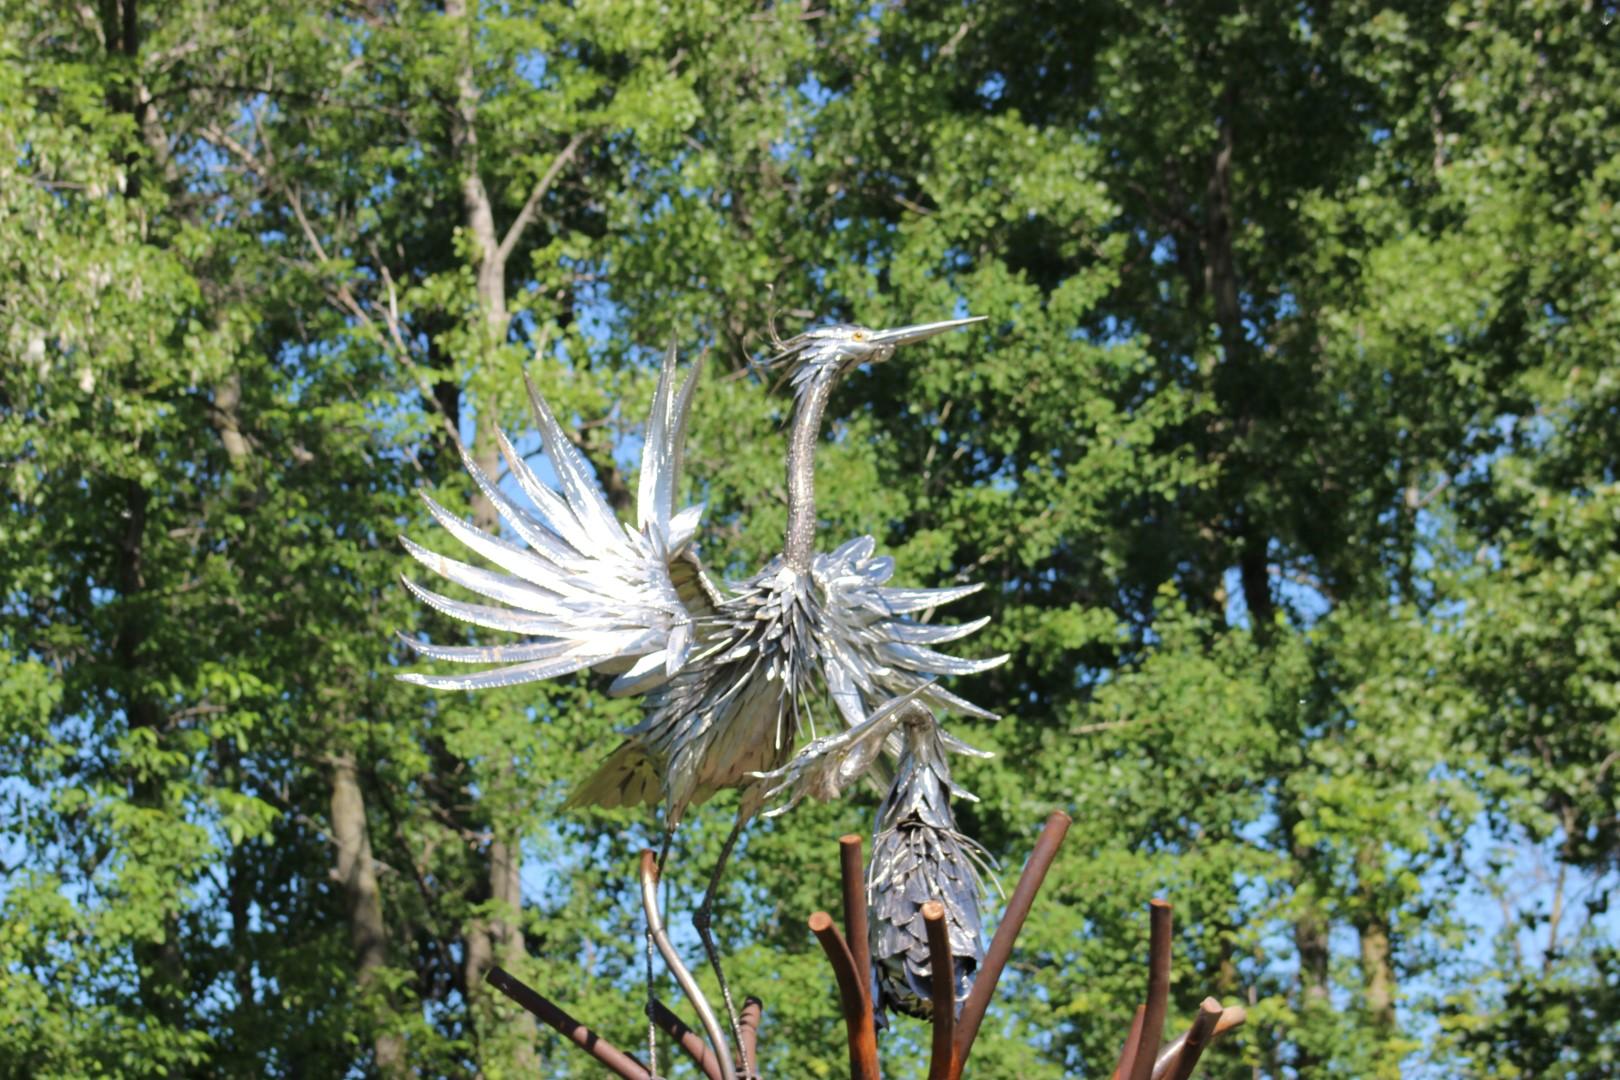 Great Blue Heron sculpture at Montezuma (photo)